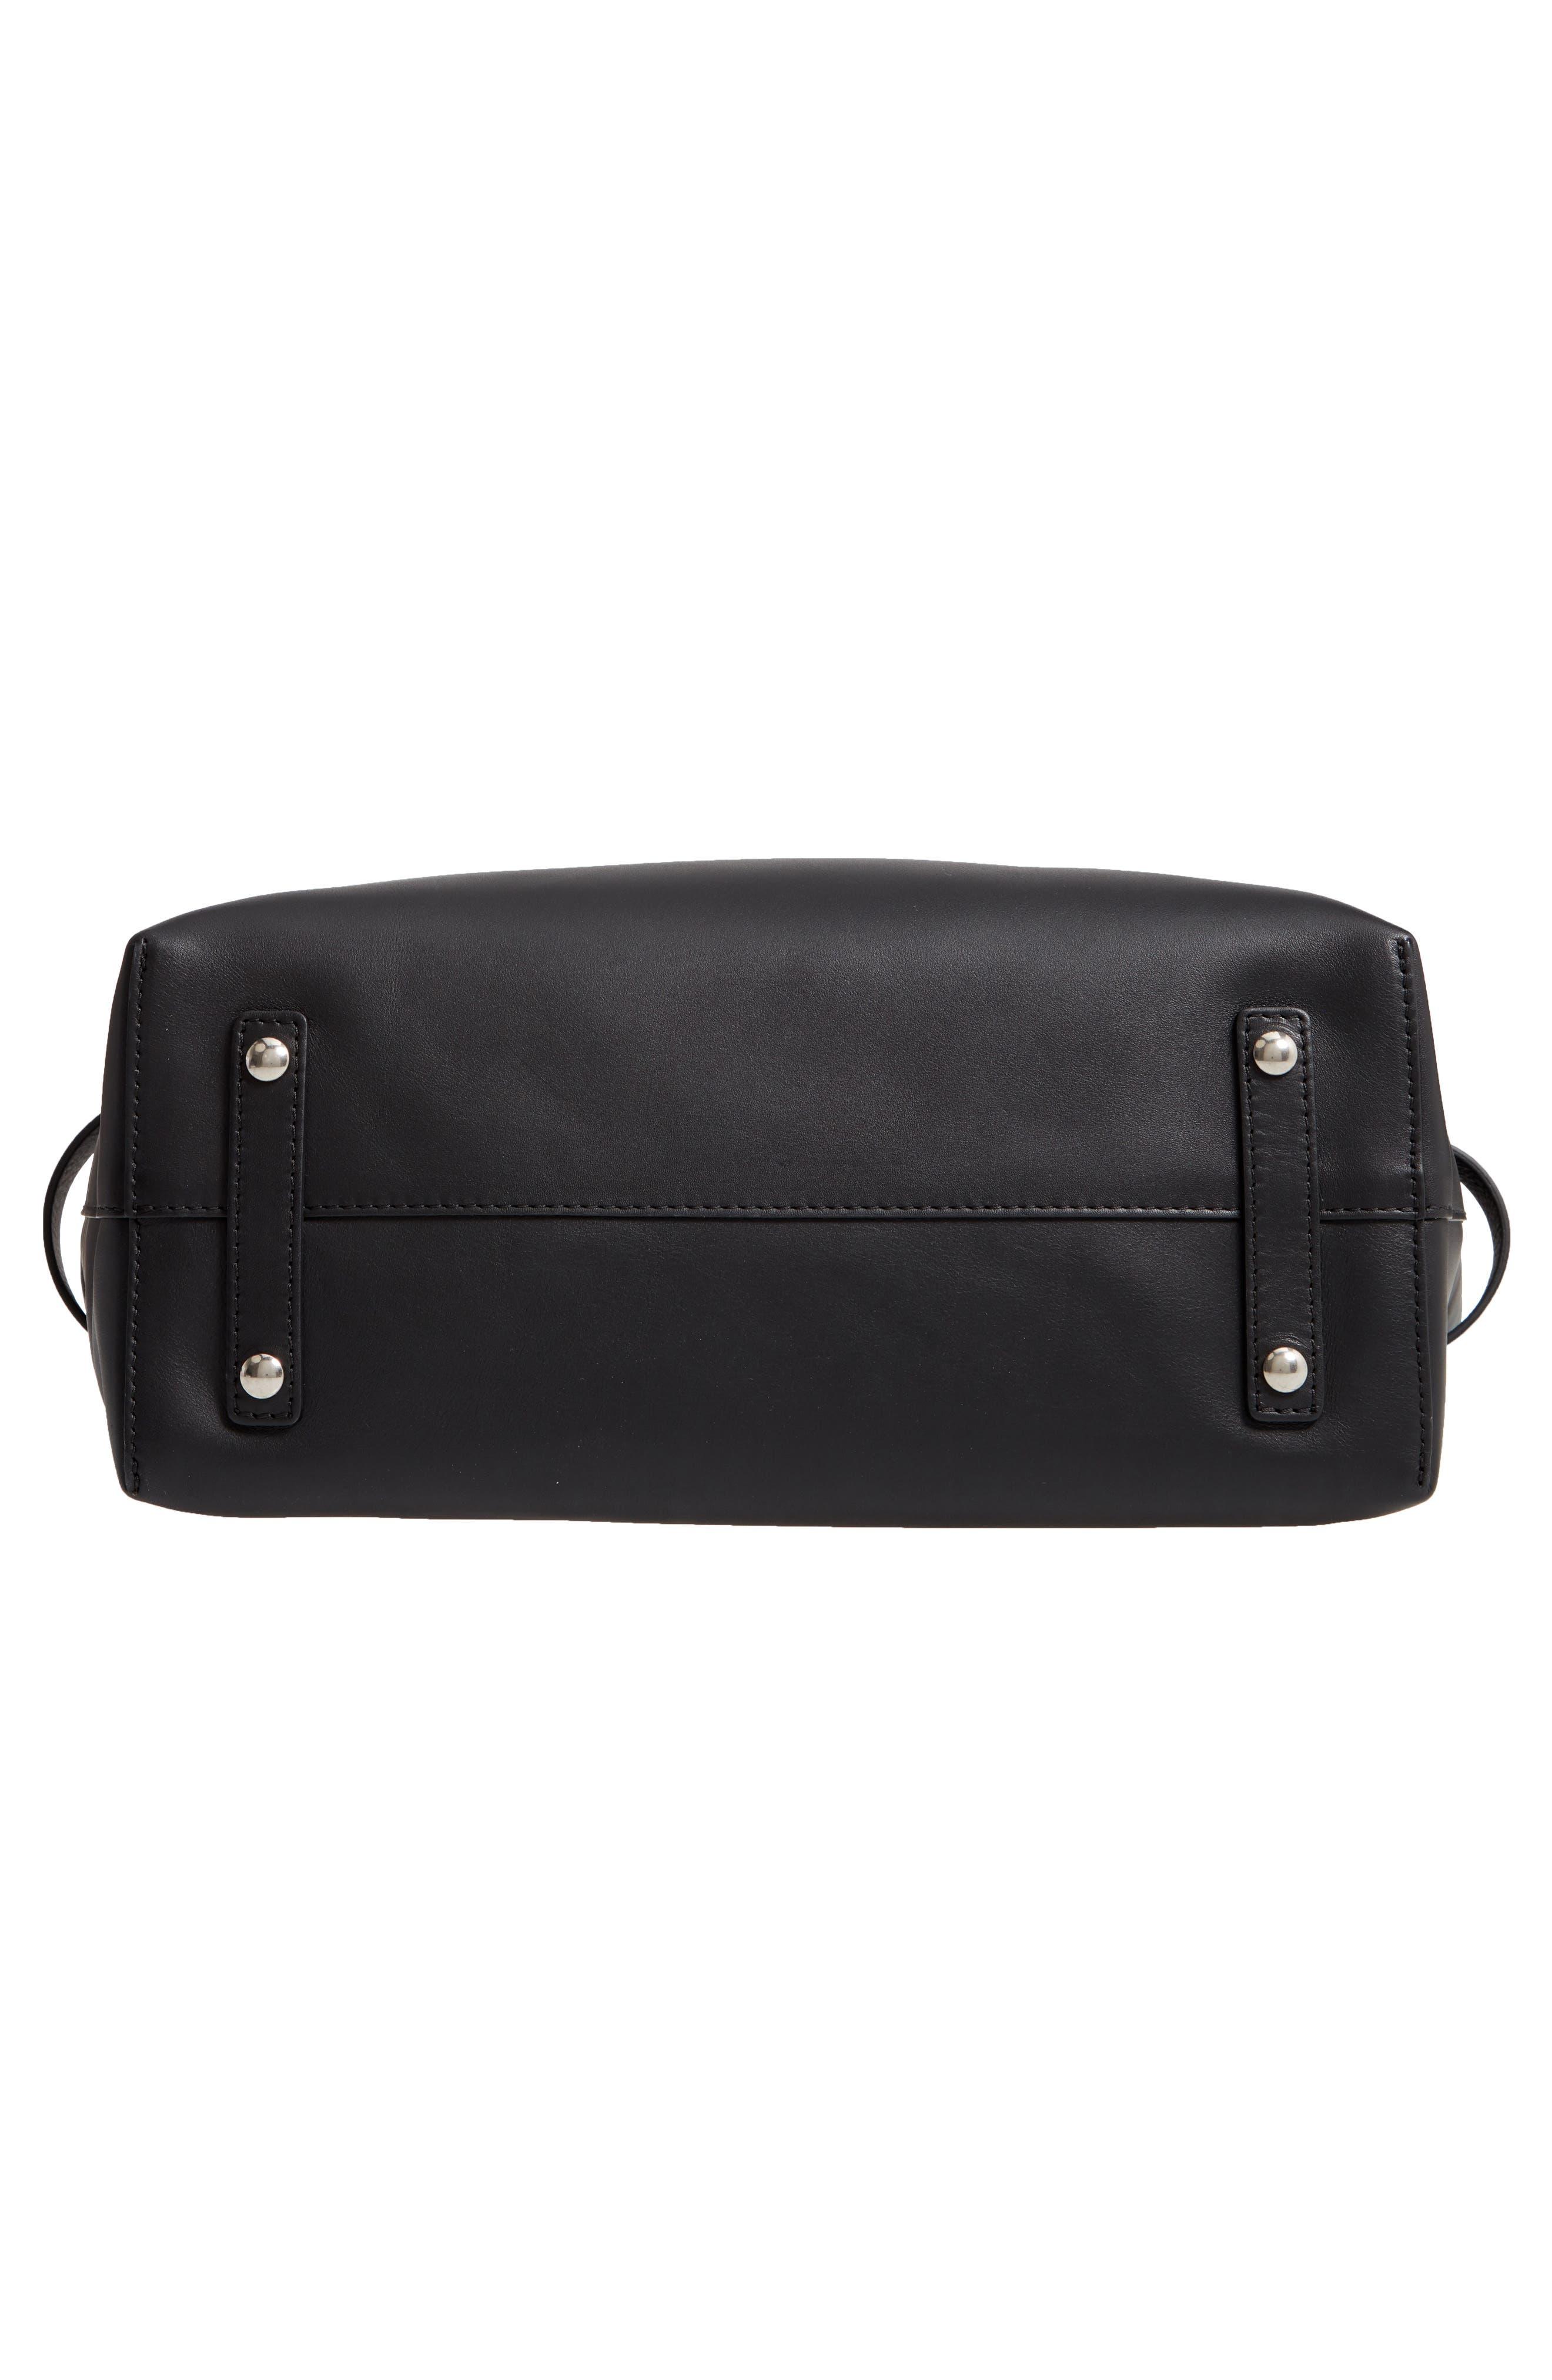 Medium Belt Bag Leather Tote,                             Alternate thumbnail 6, color,                             BLACK